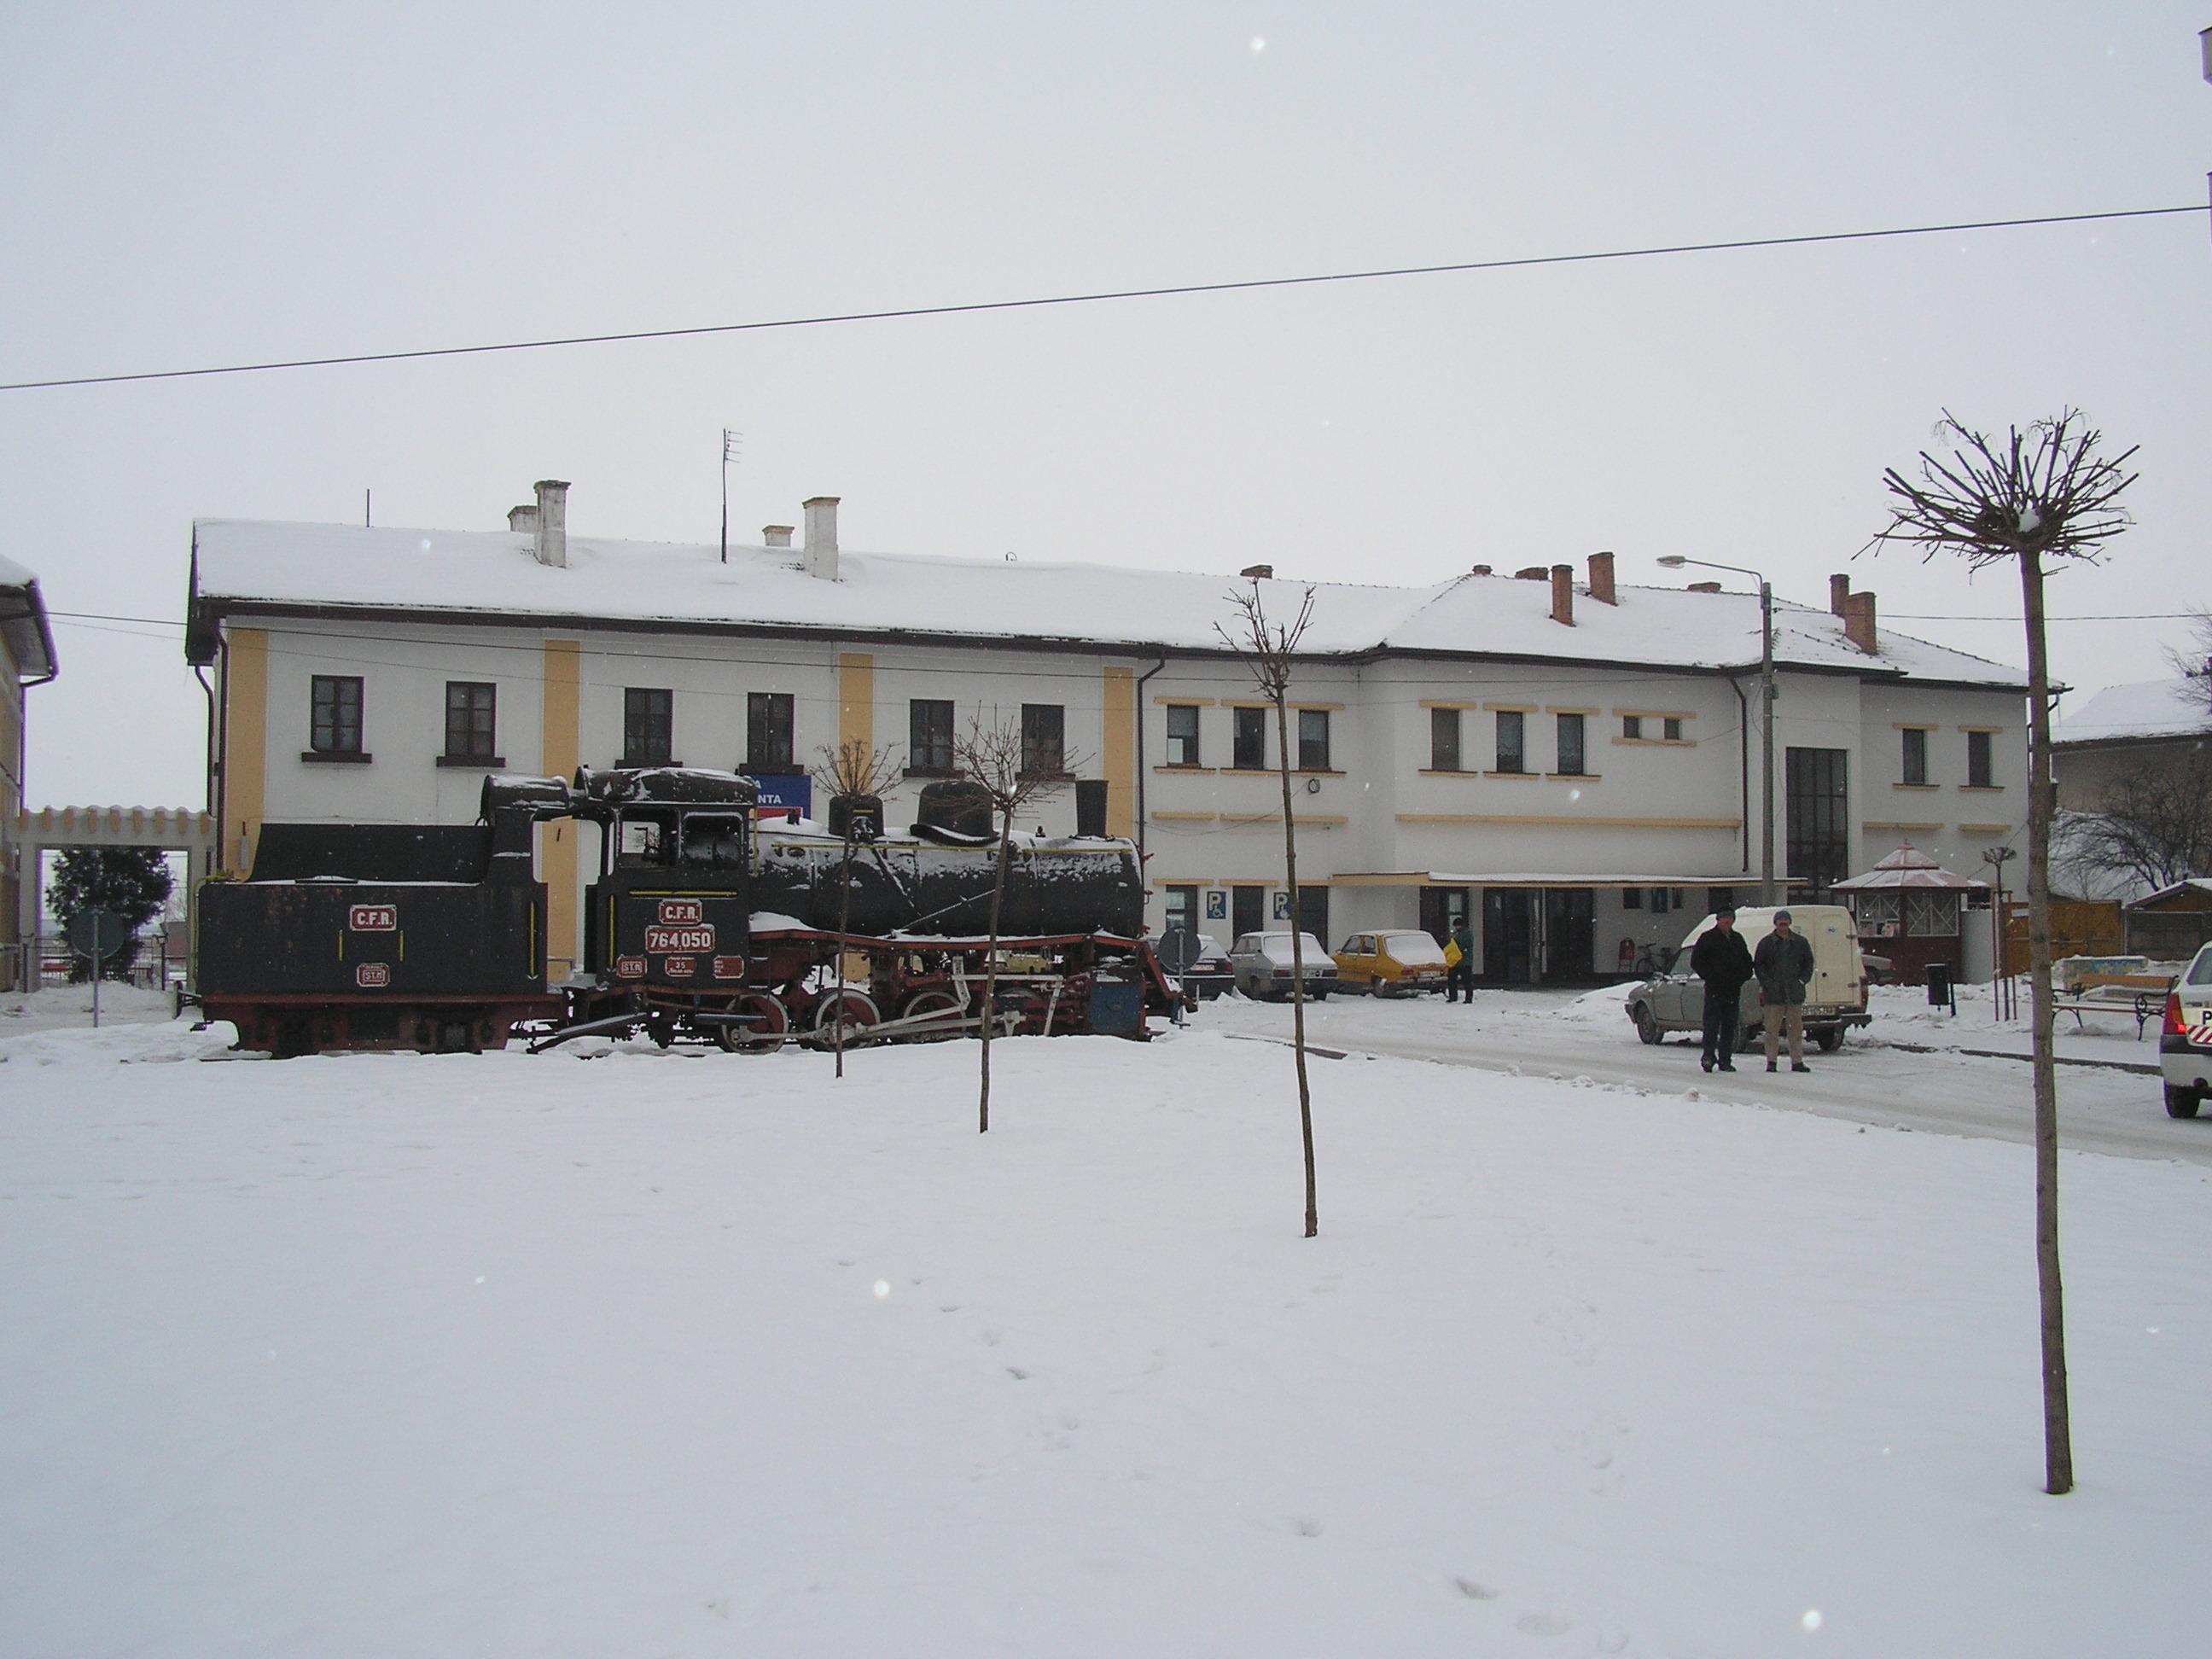 Fişier:RO BH Salonta Locomotiva cu abur.JPG